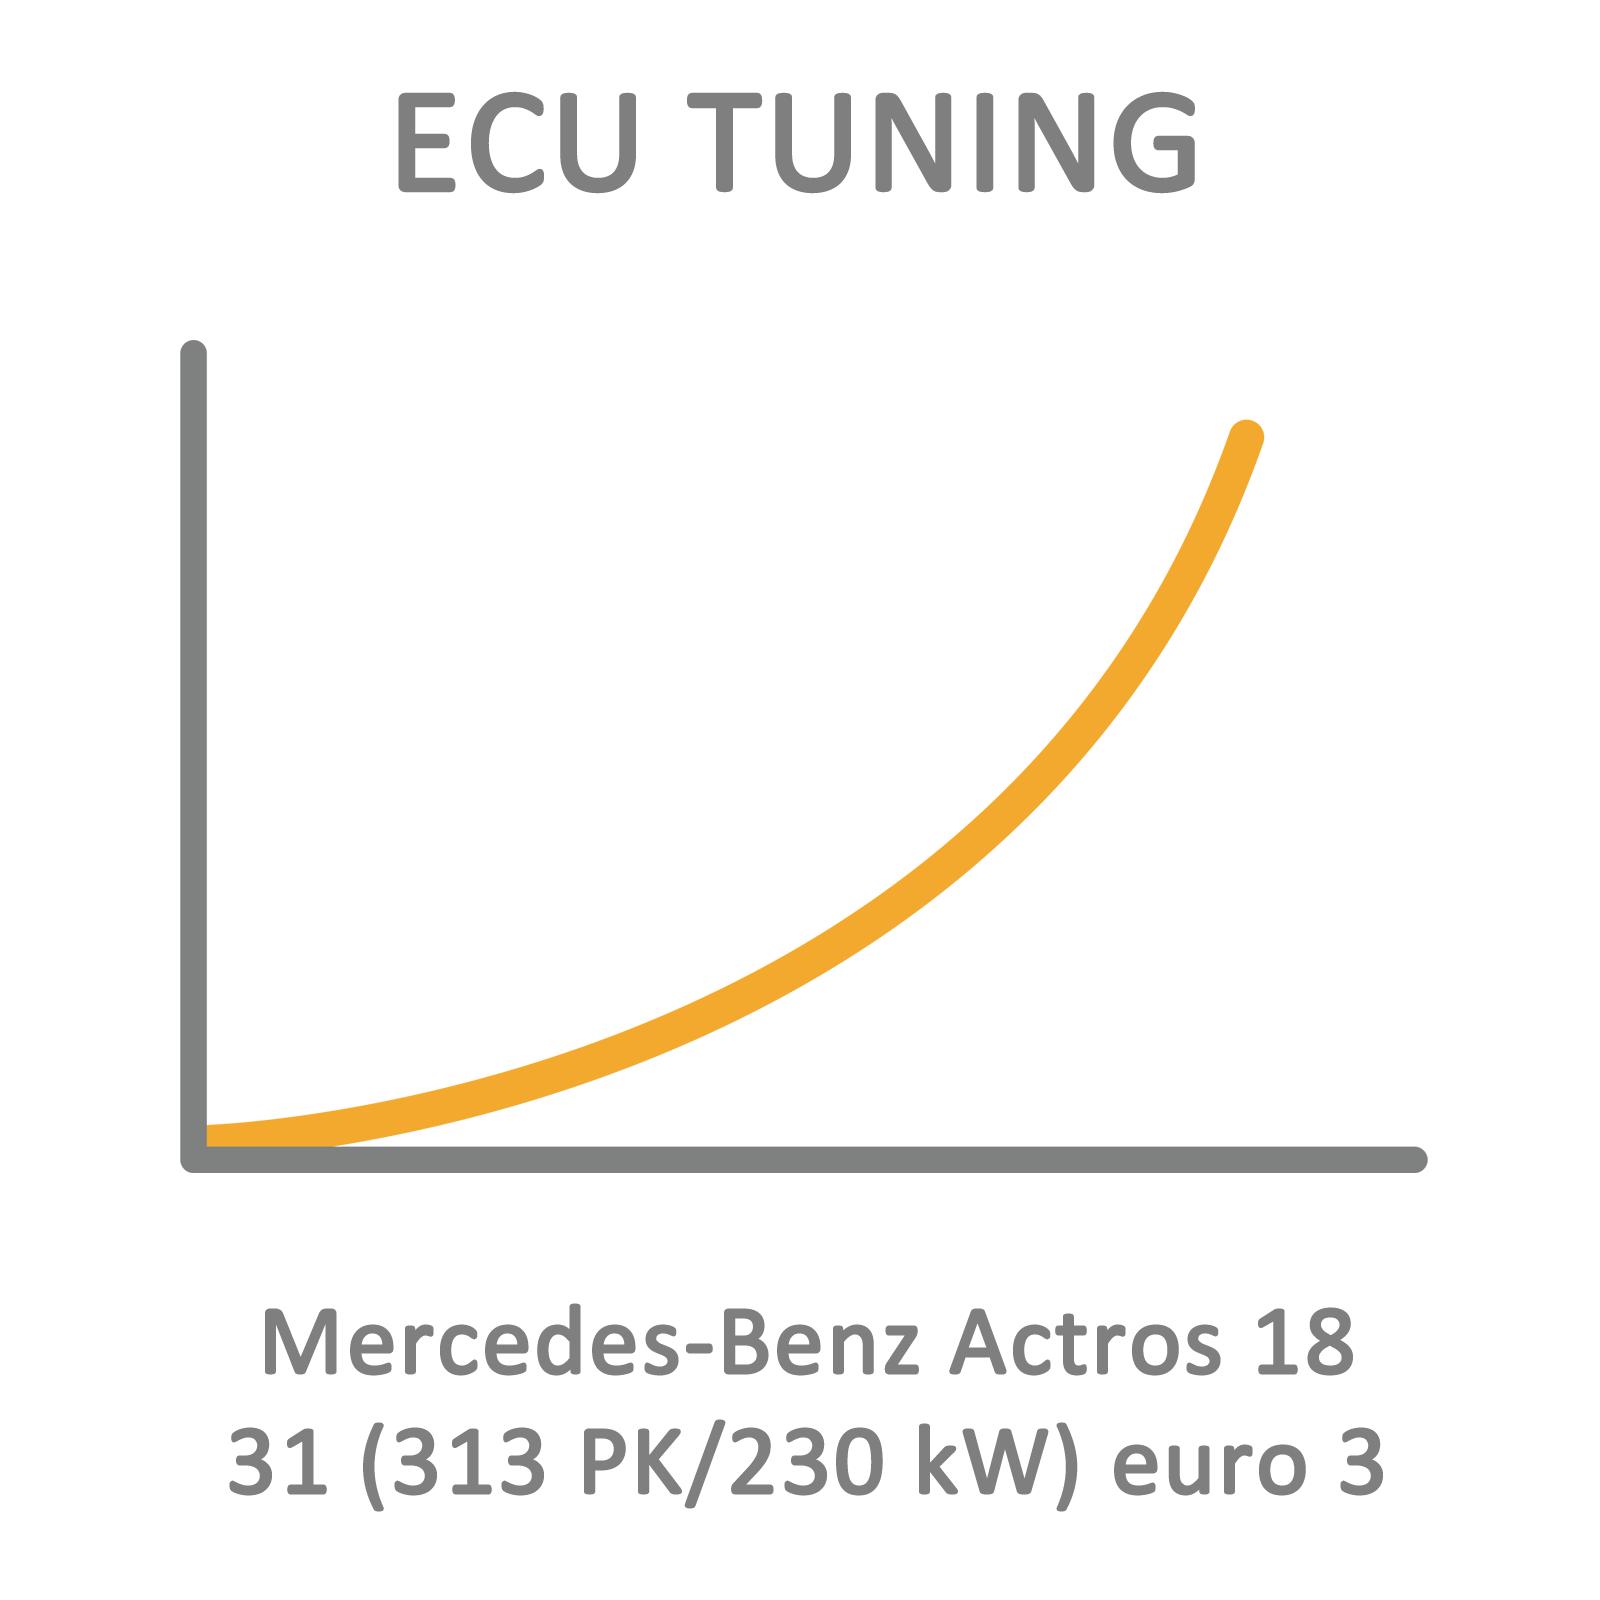 Mercedes-Benz Actros 18 31 (313 PK/230 kW) euro 3 ECU